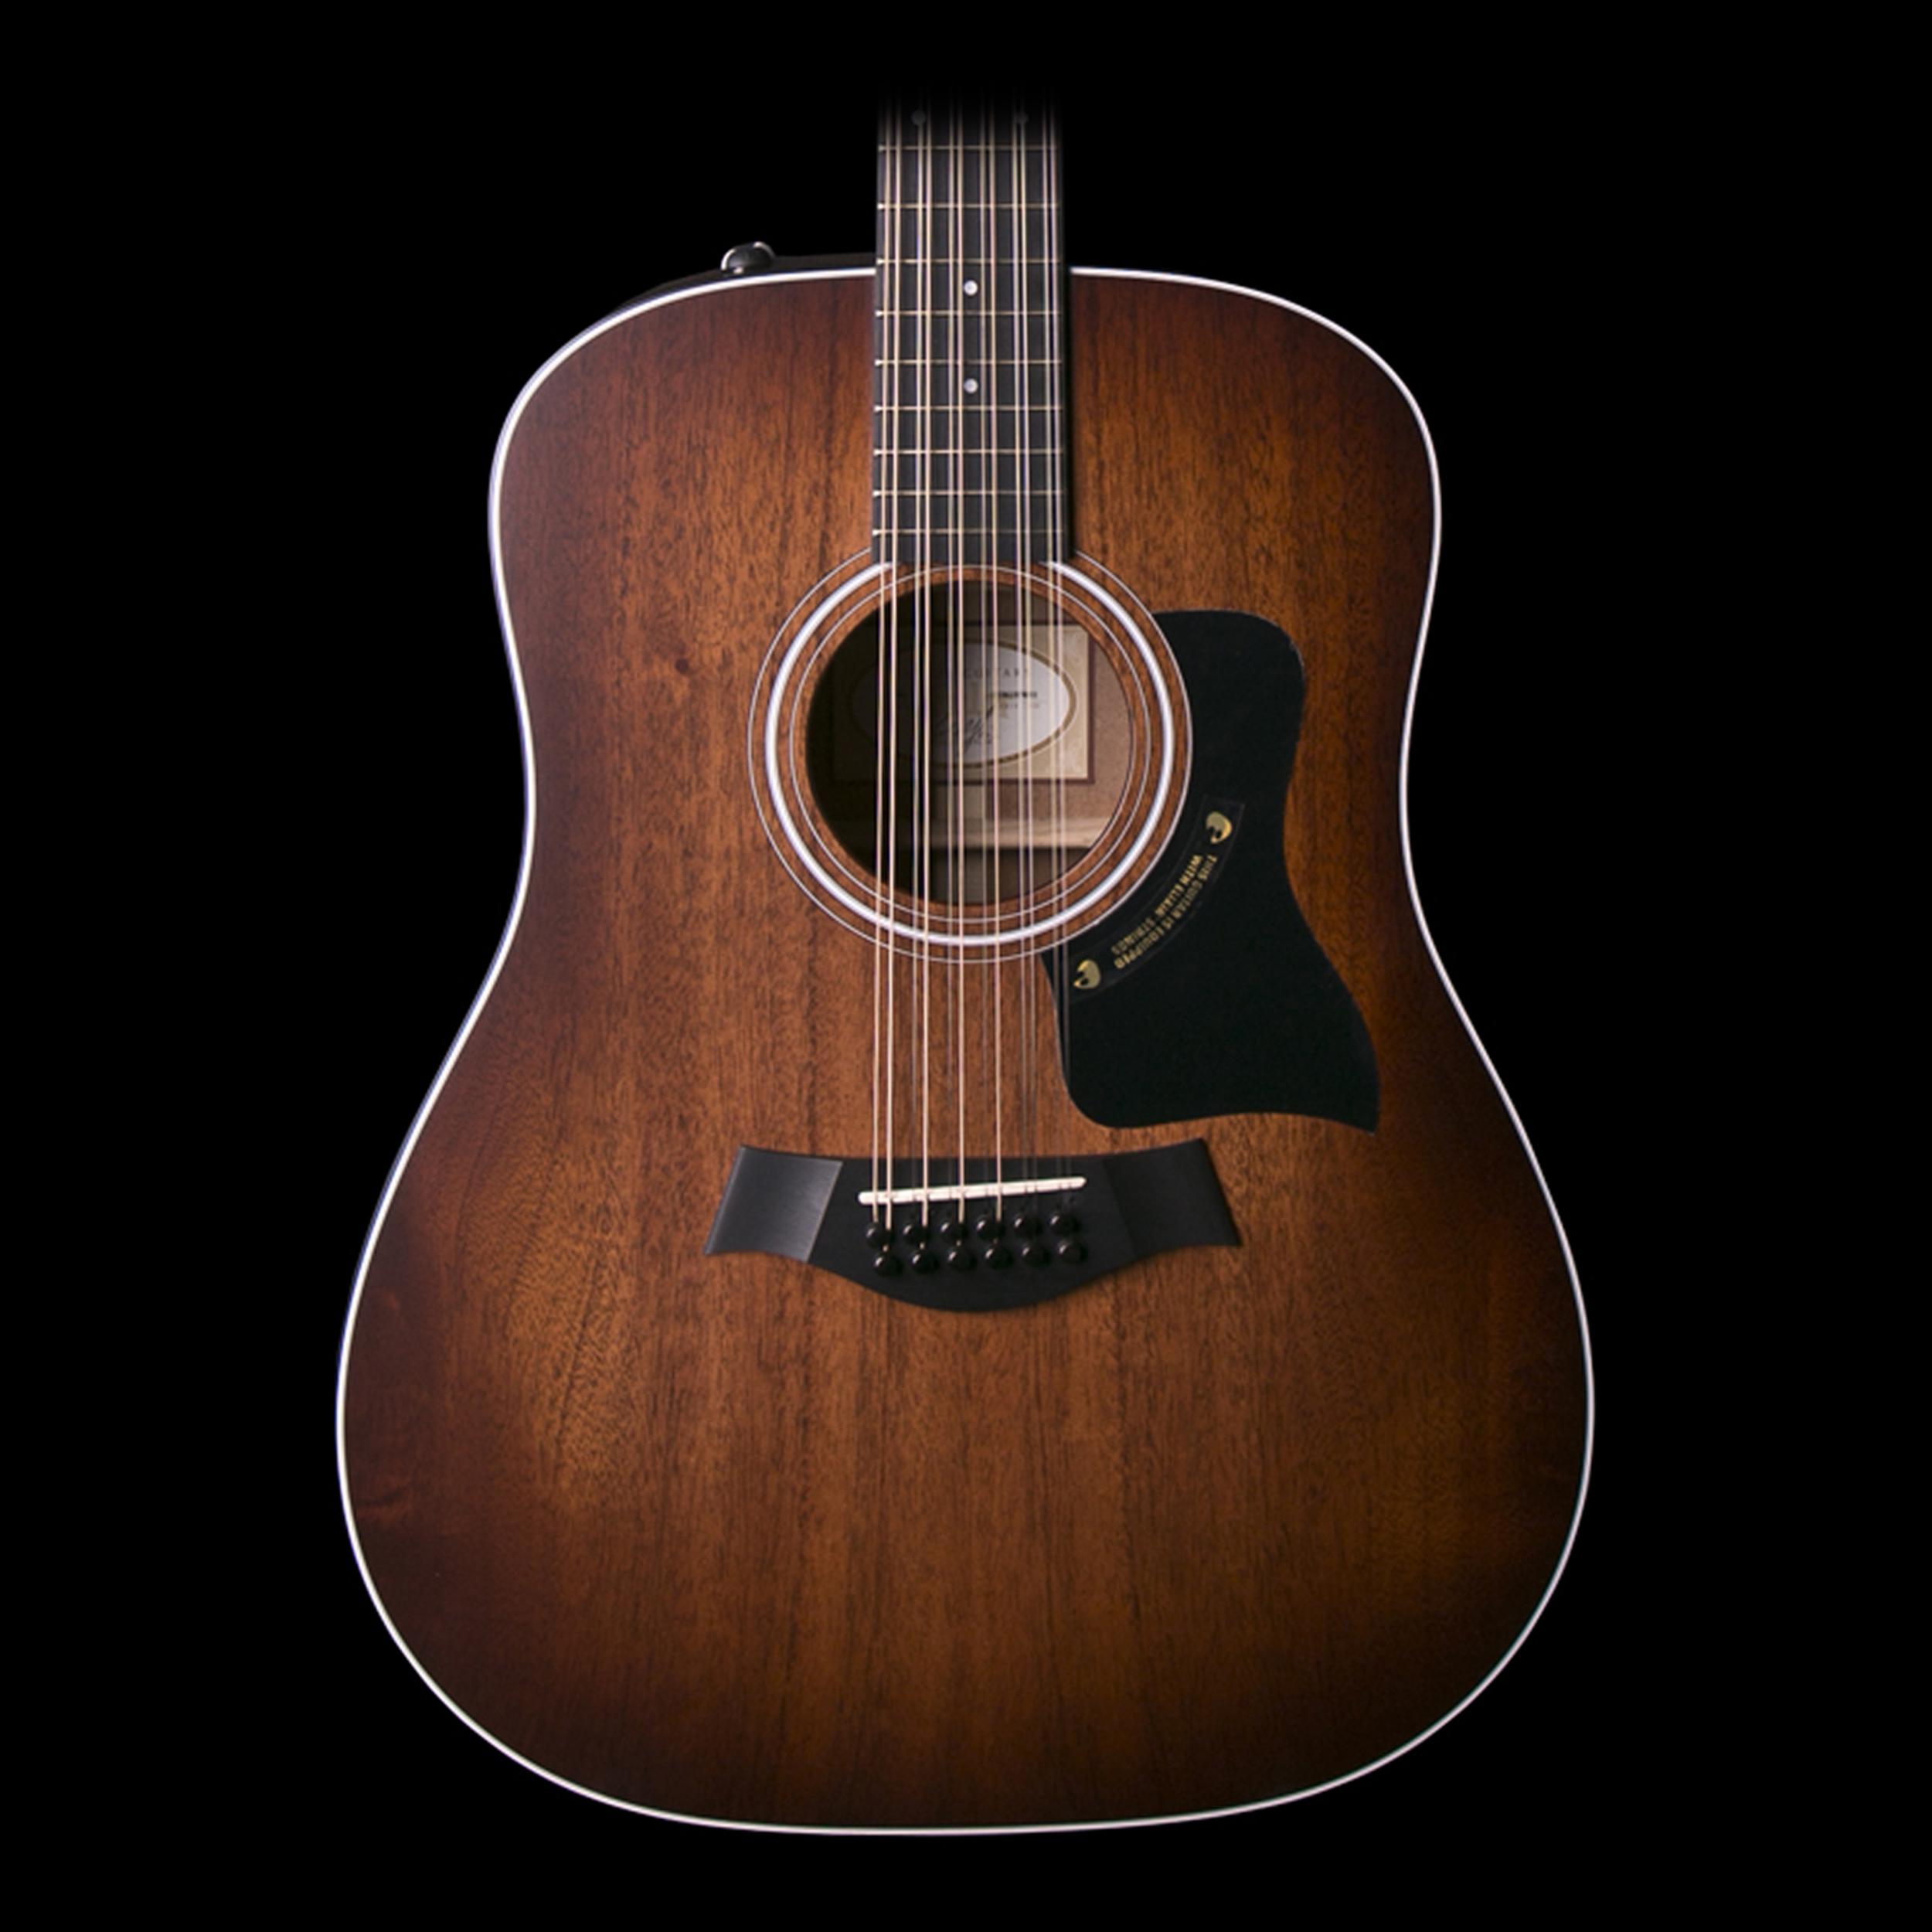 taylor 360e 12 string dreadnought shaded edgeburst acoustic guitar ebay. Black Bedroom Furniture Sets. Home Design Ideas